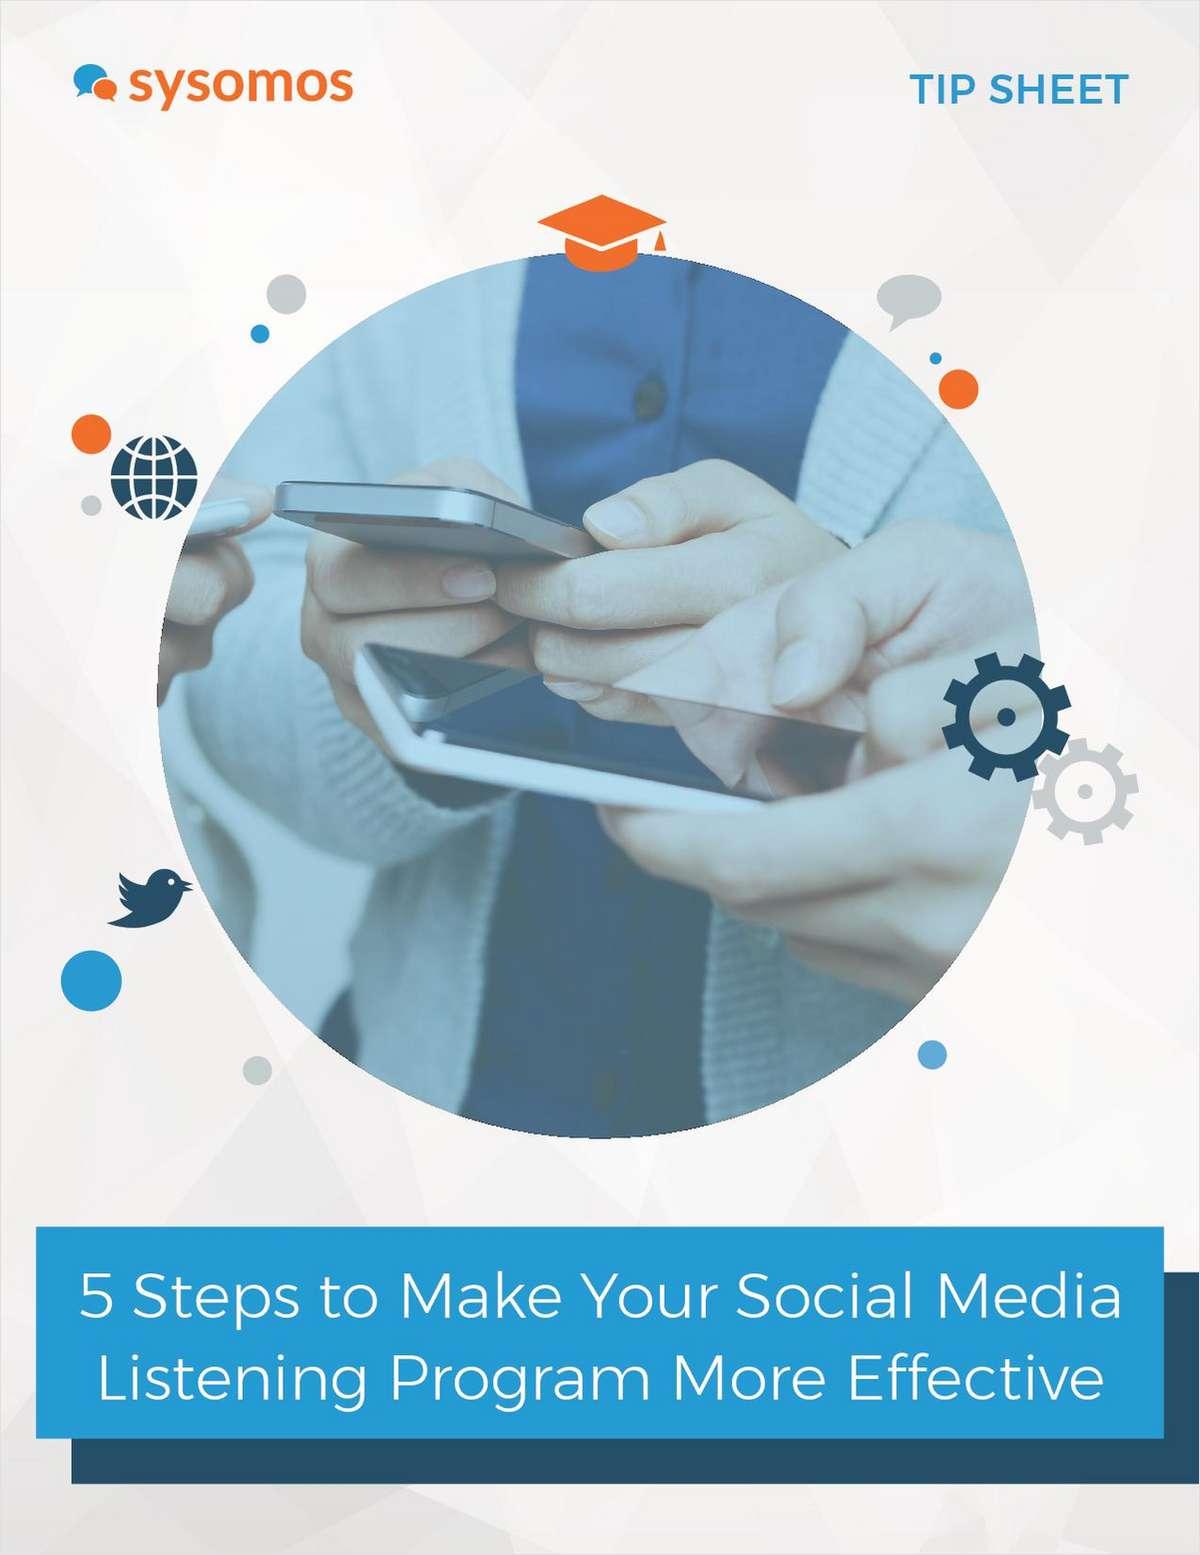 5 Steps to Make Your Social Media Listening Program More Effective